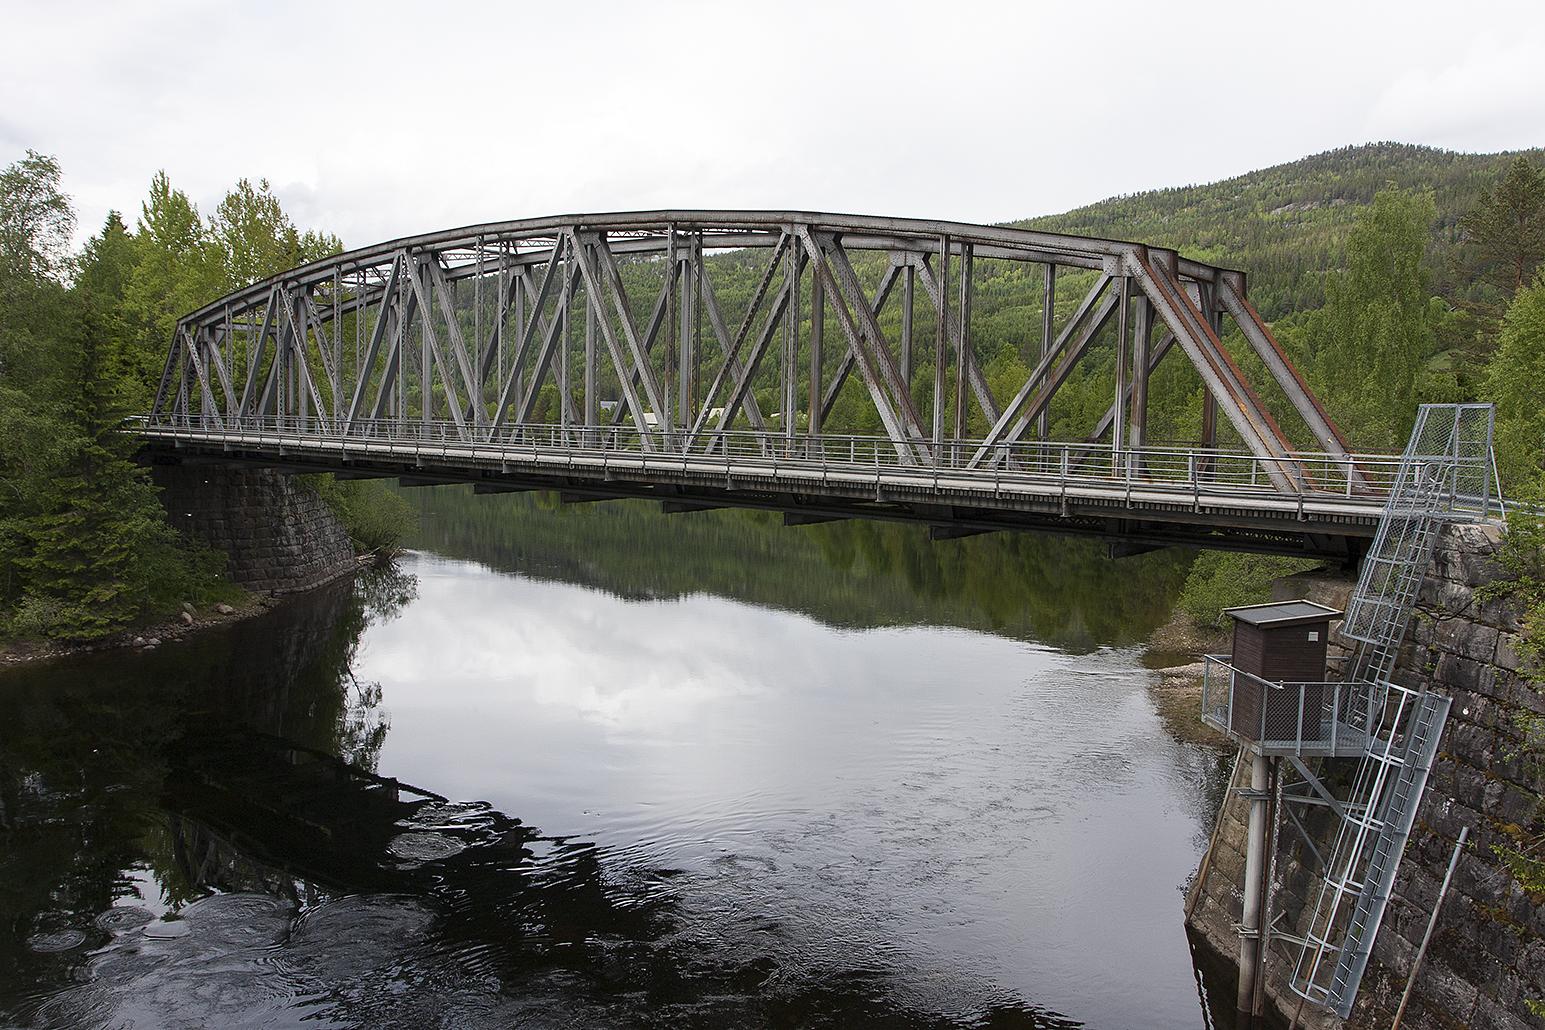 Bruhaug bru Numedalsbanen. Foto: Ulf Ingmar Gustafsson Riksantikvaren